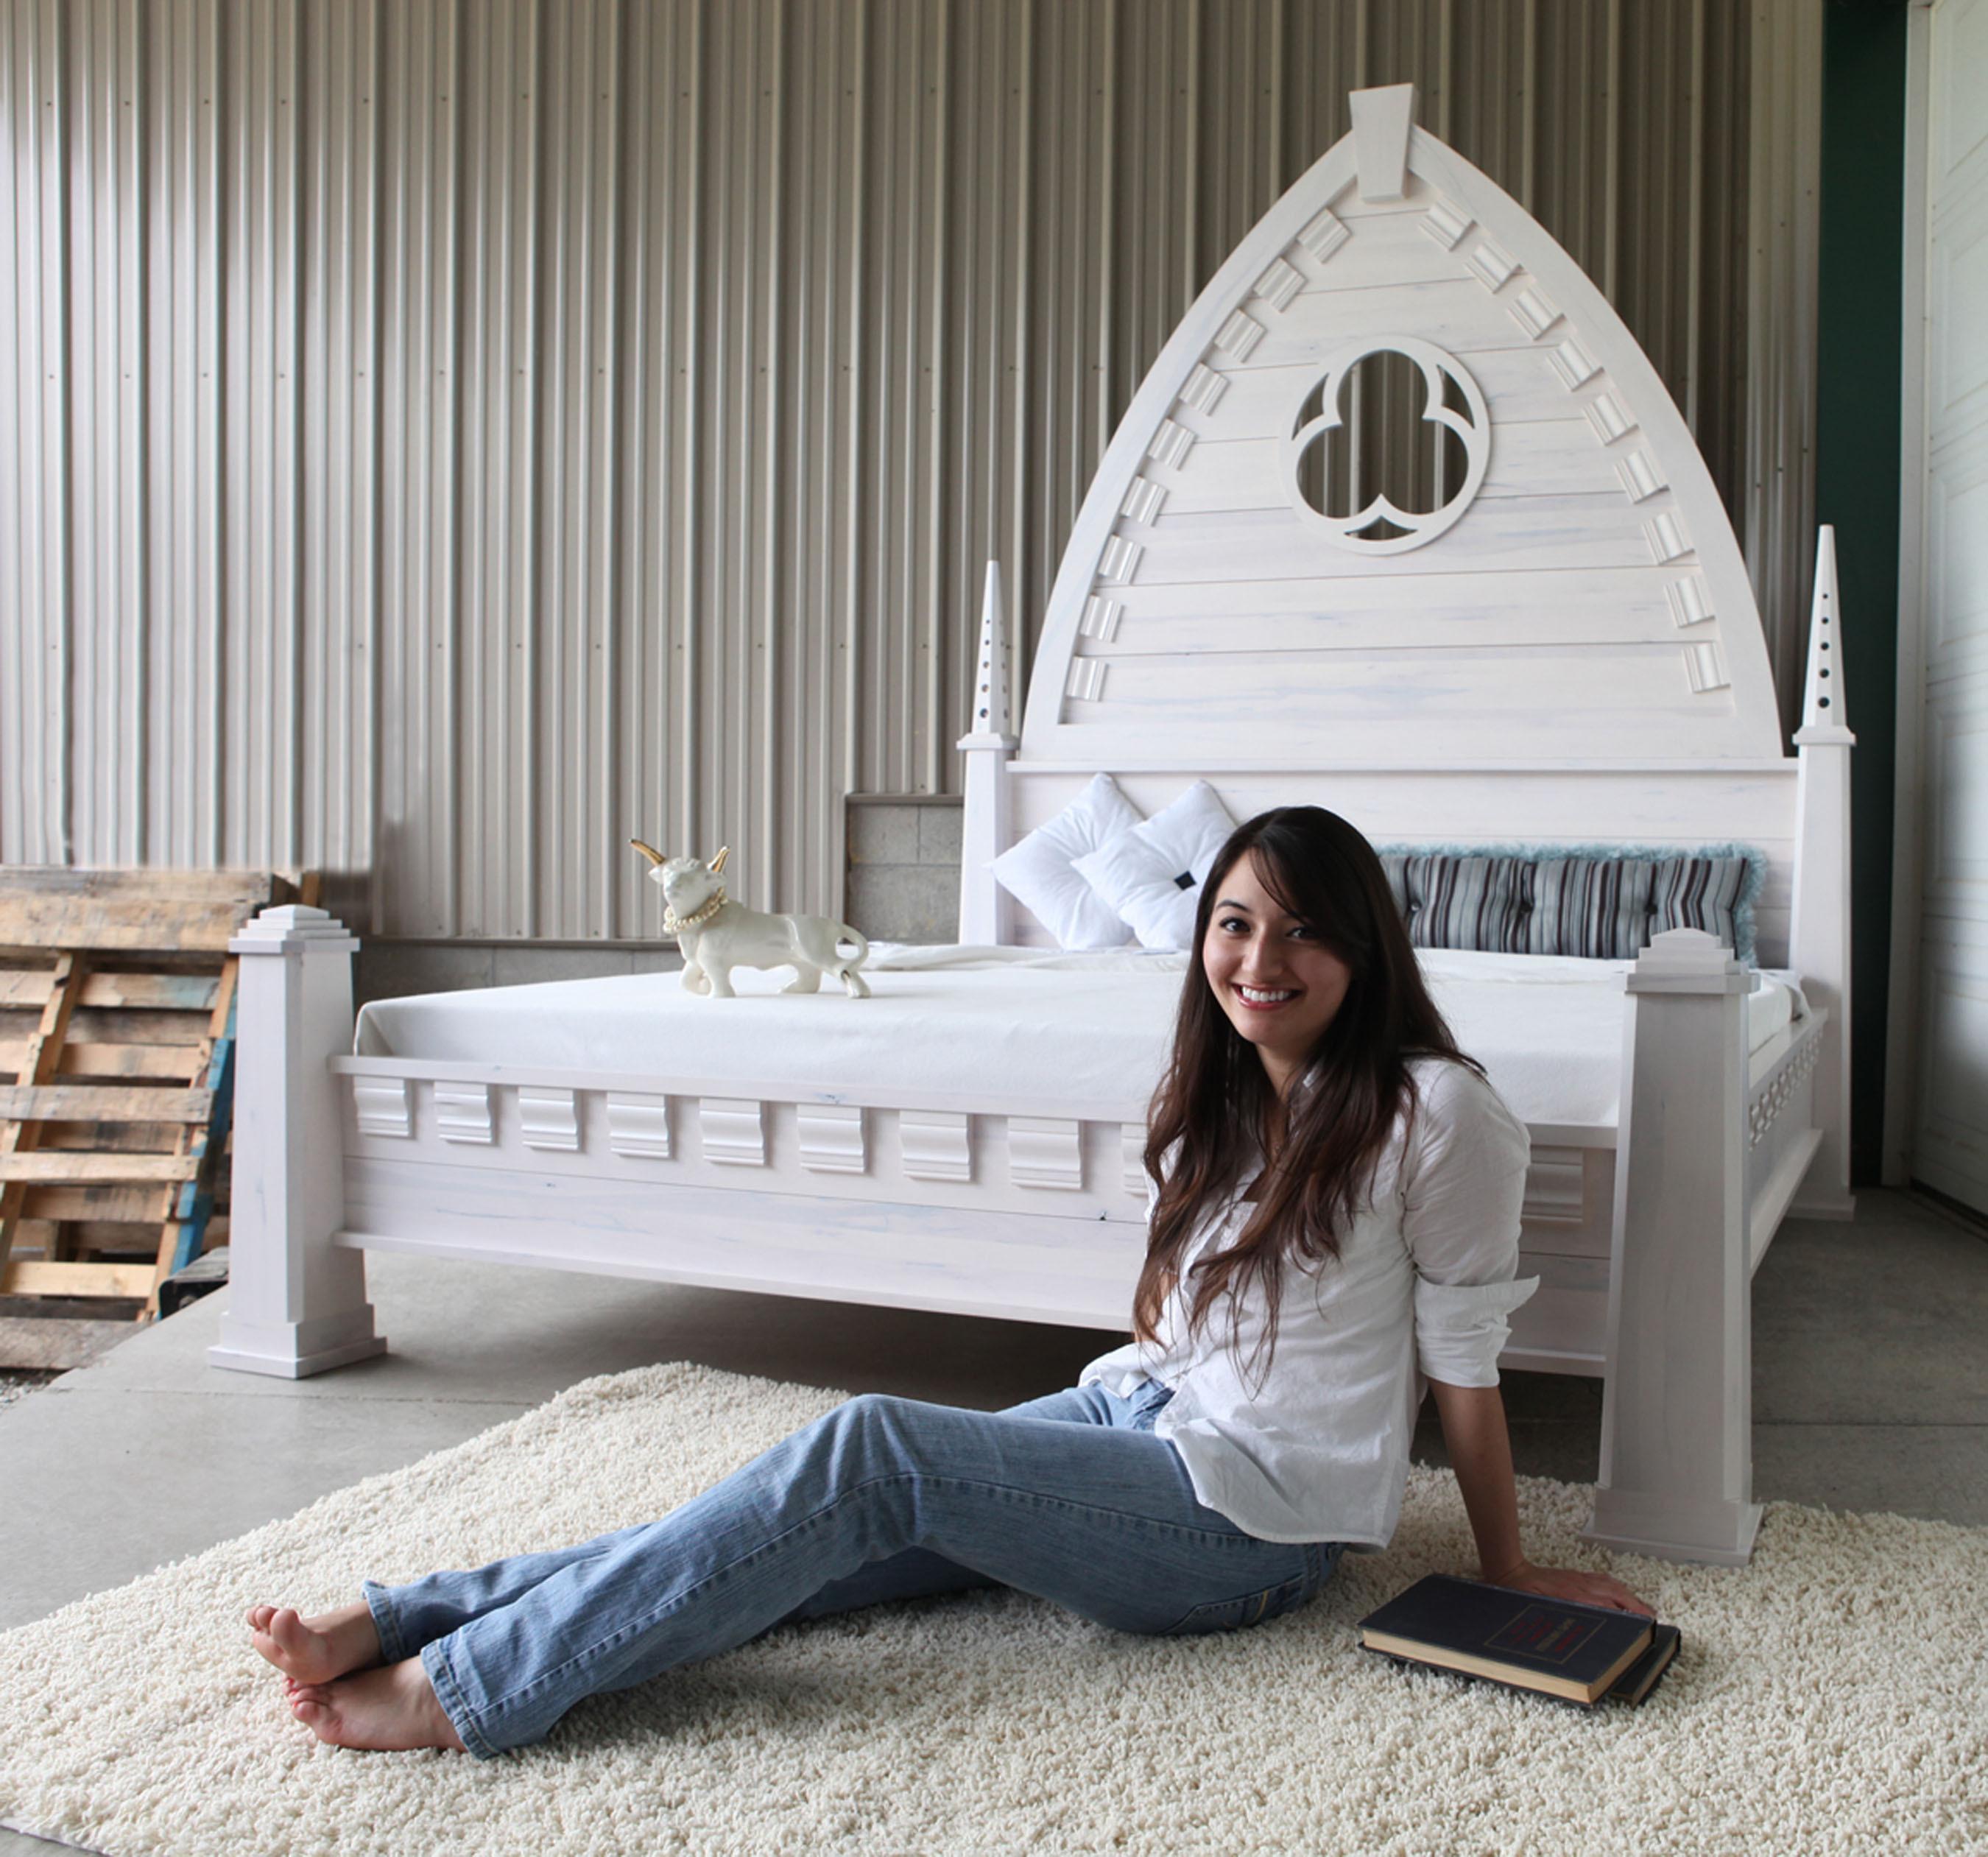 CUSTOMMADE COM GOTHIC BED | www fashion+lifestyle wordpress com